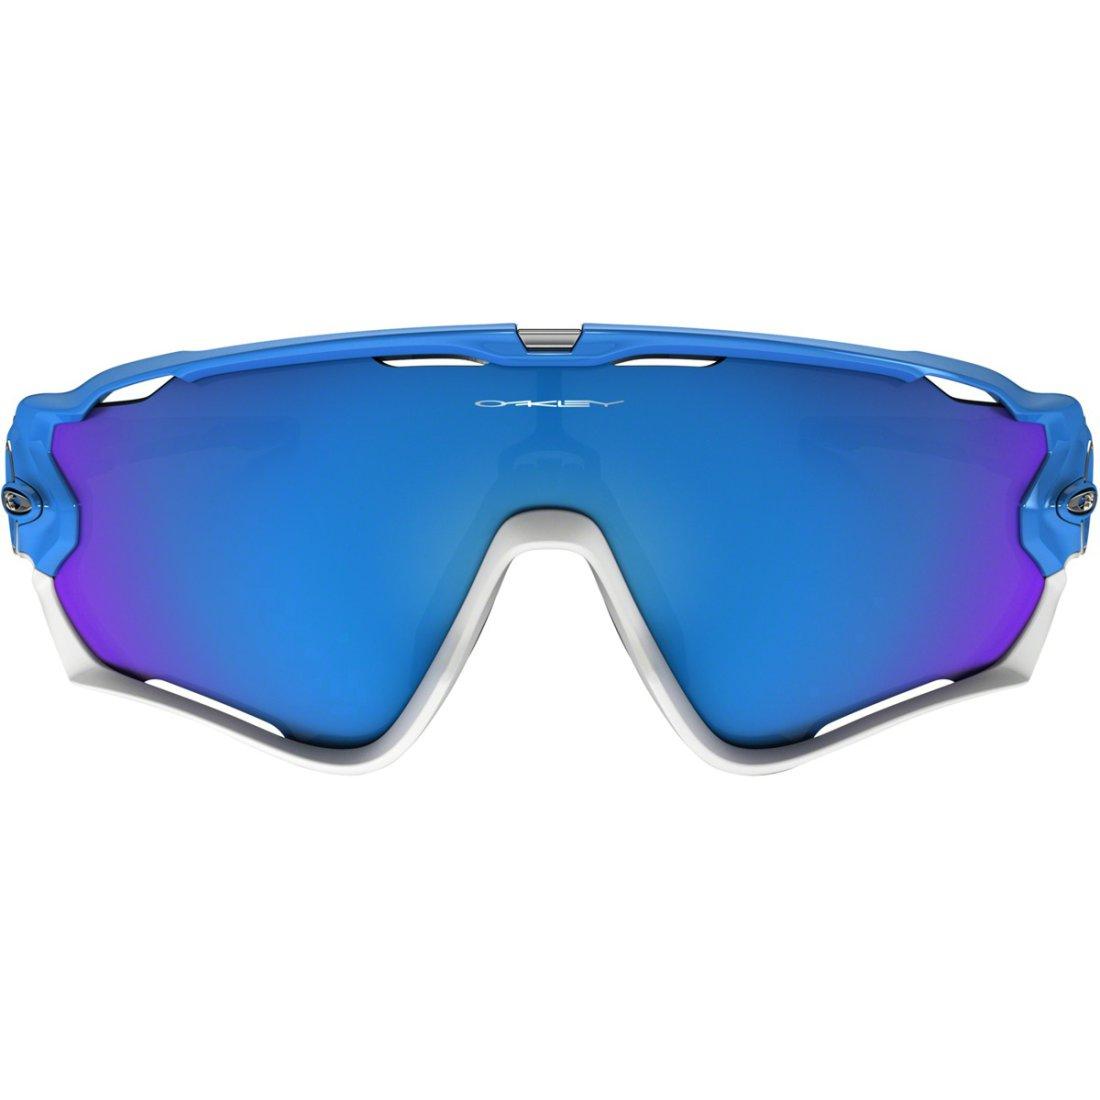 6fe3b73ec77f7 Máscara   Gafas OAKLEY Jawbreaker Sky Blue   Sapphire Iridium · Motocard